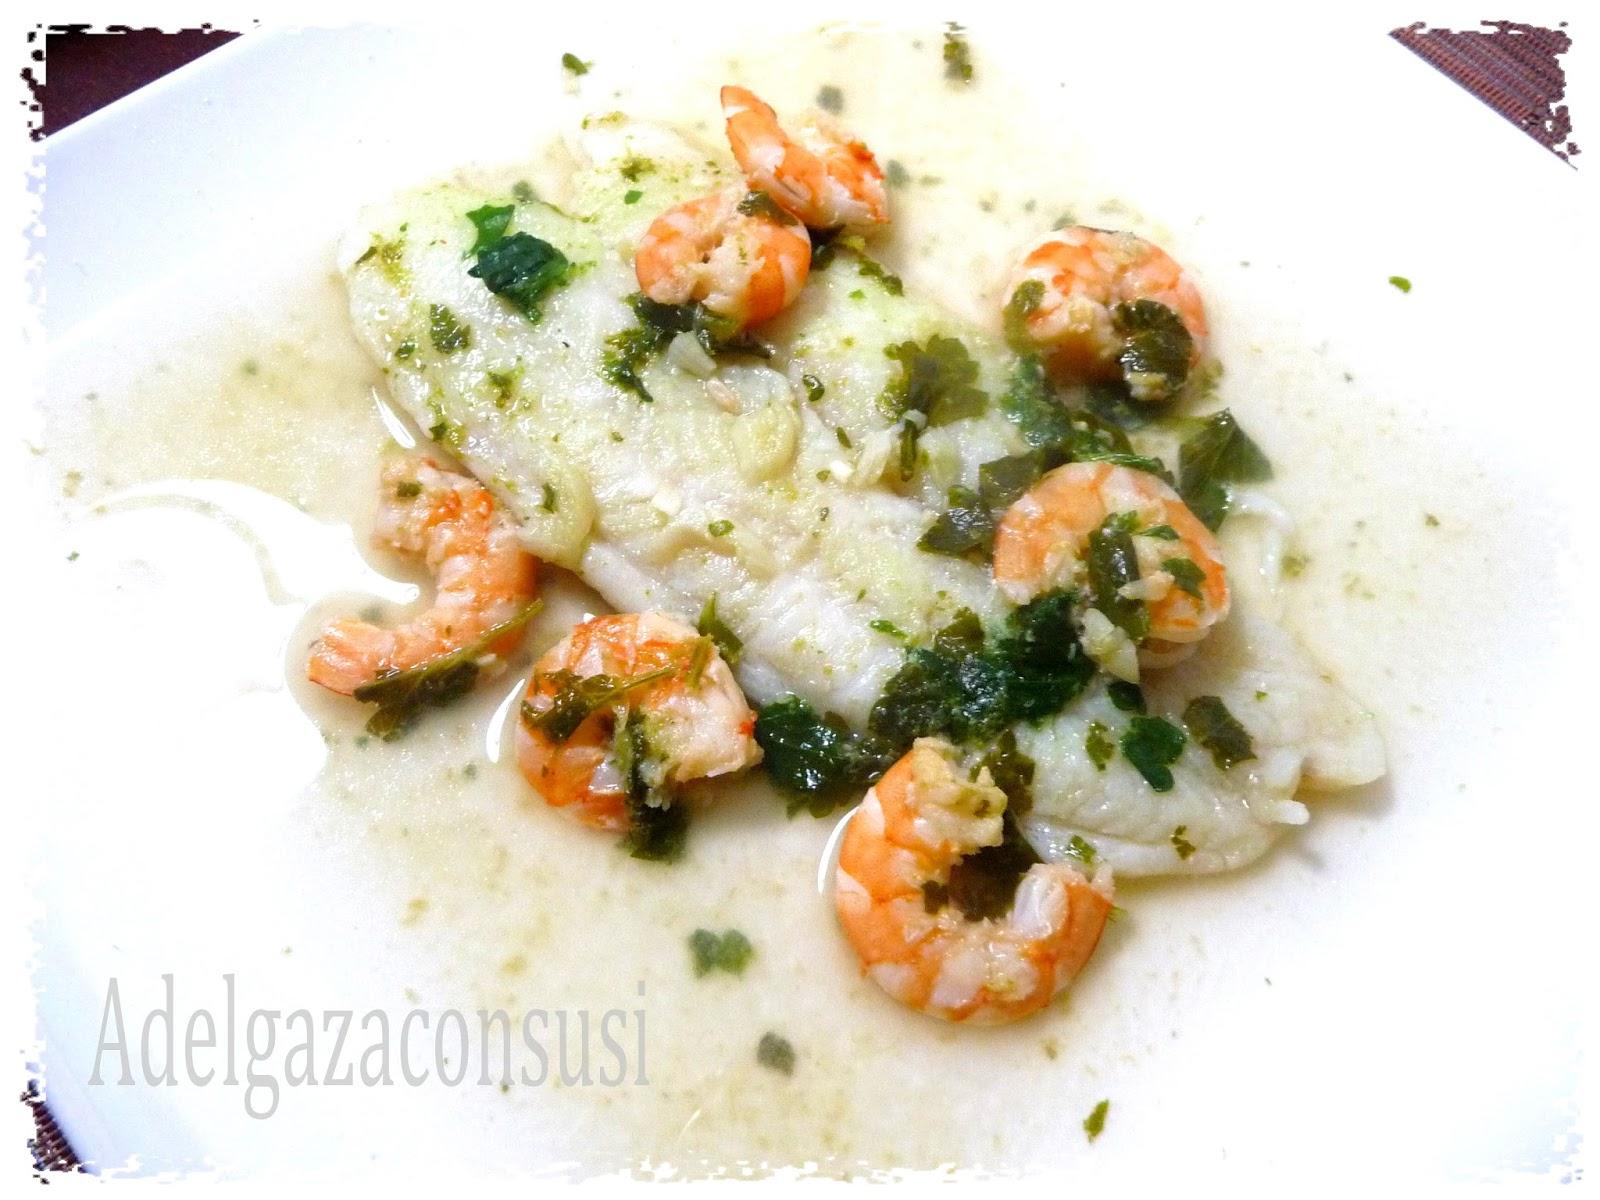 Recetas light adelgazaconsusi pescado blanco al vino blanco en microondas - Cocinar pescado en microondas ...